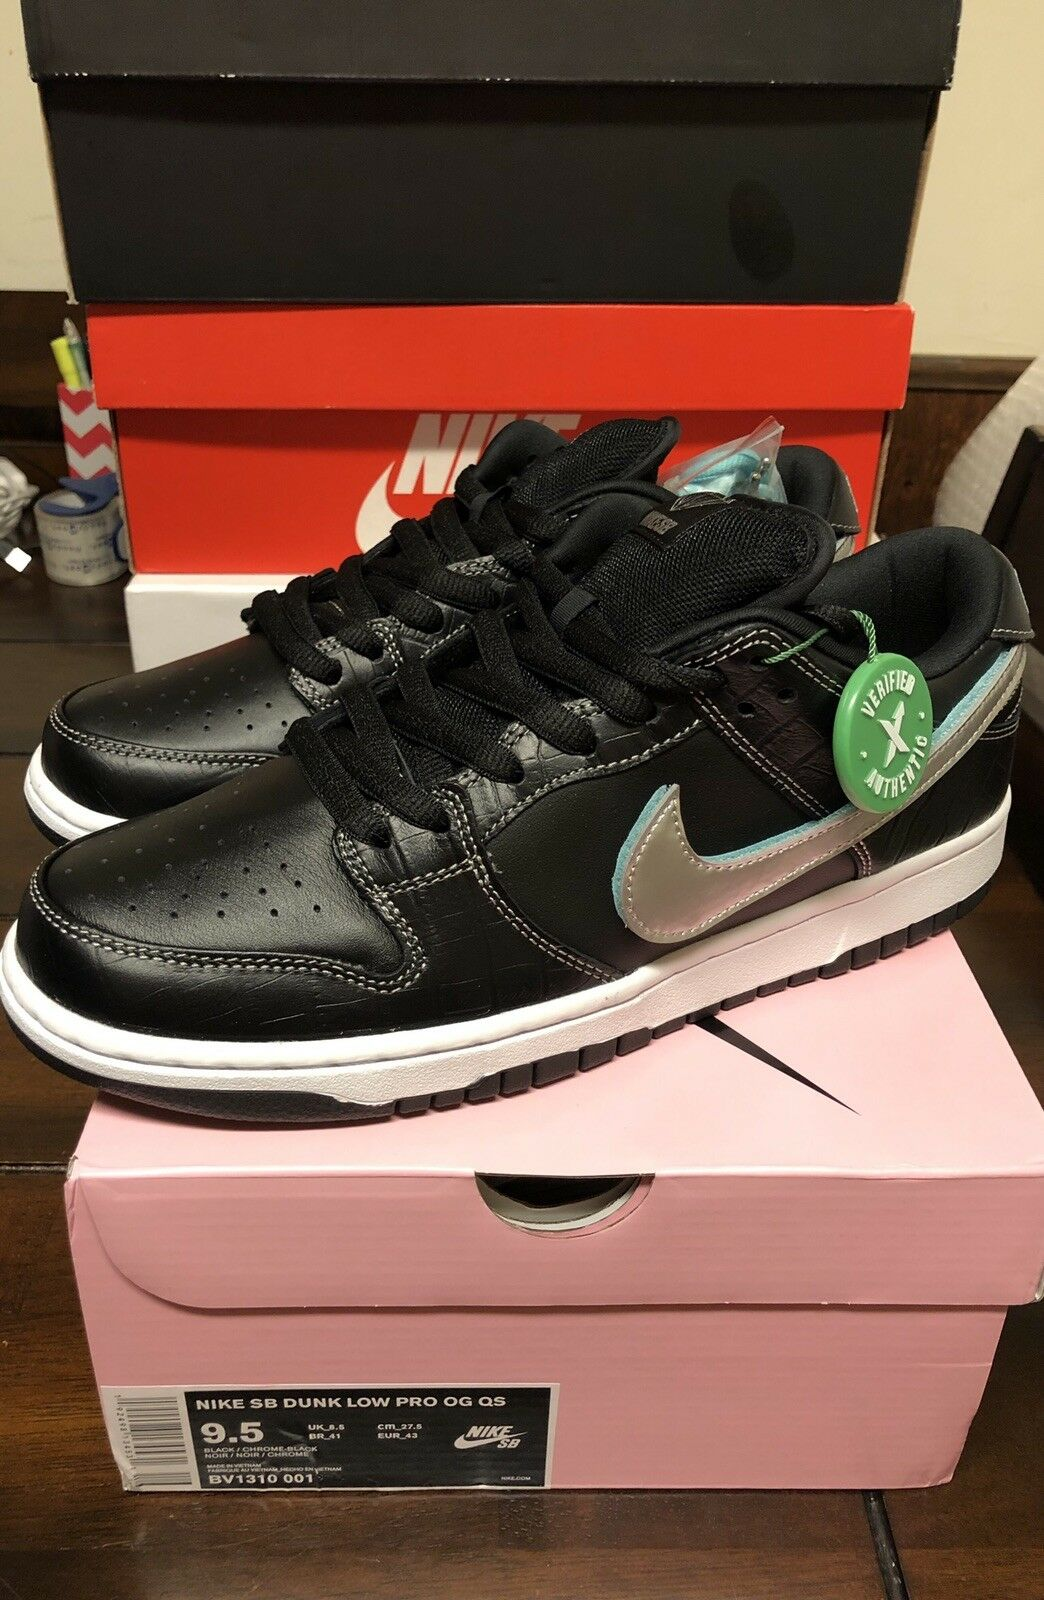 Nike SB Dunk Low Diamond Supply Black BV1310-001 Size 9.5 New Authentic